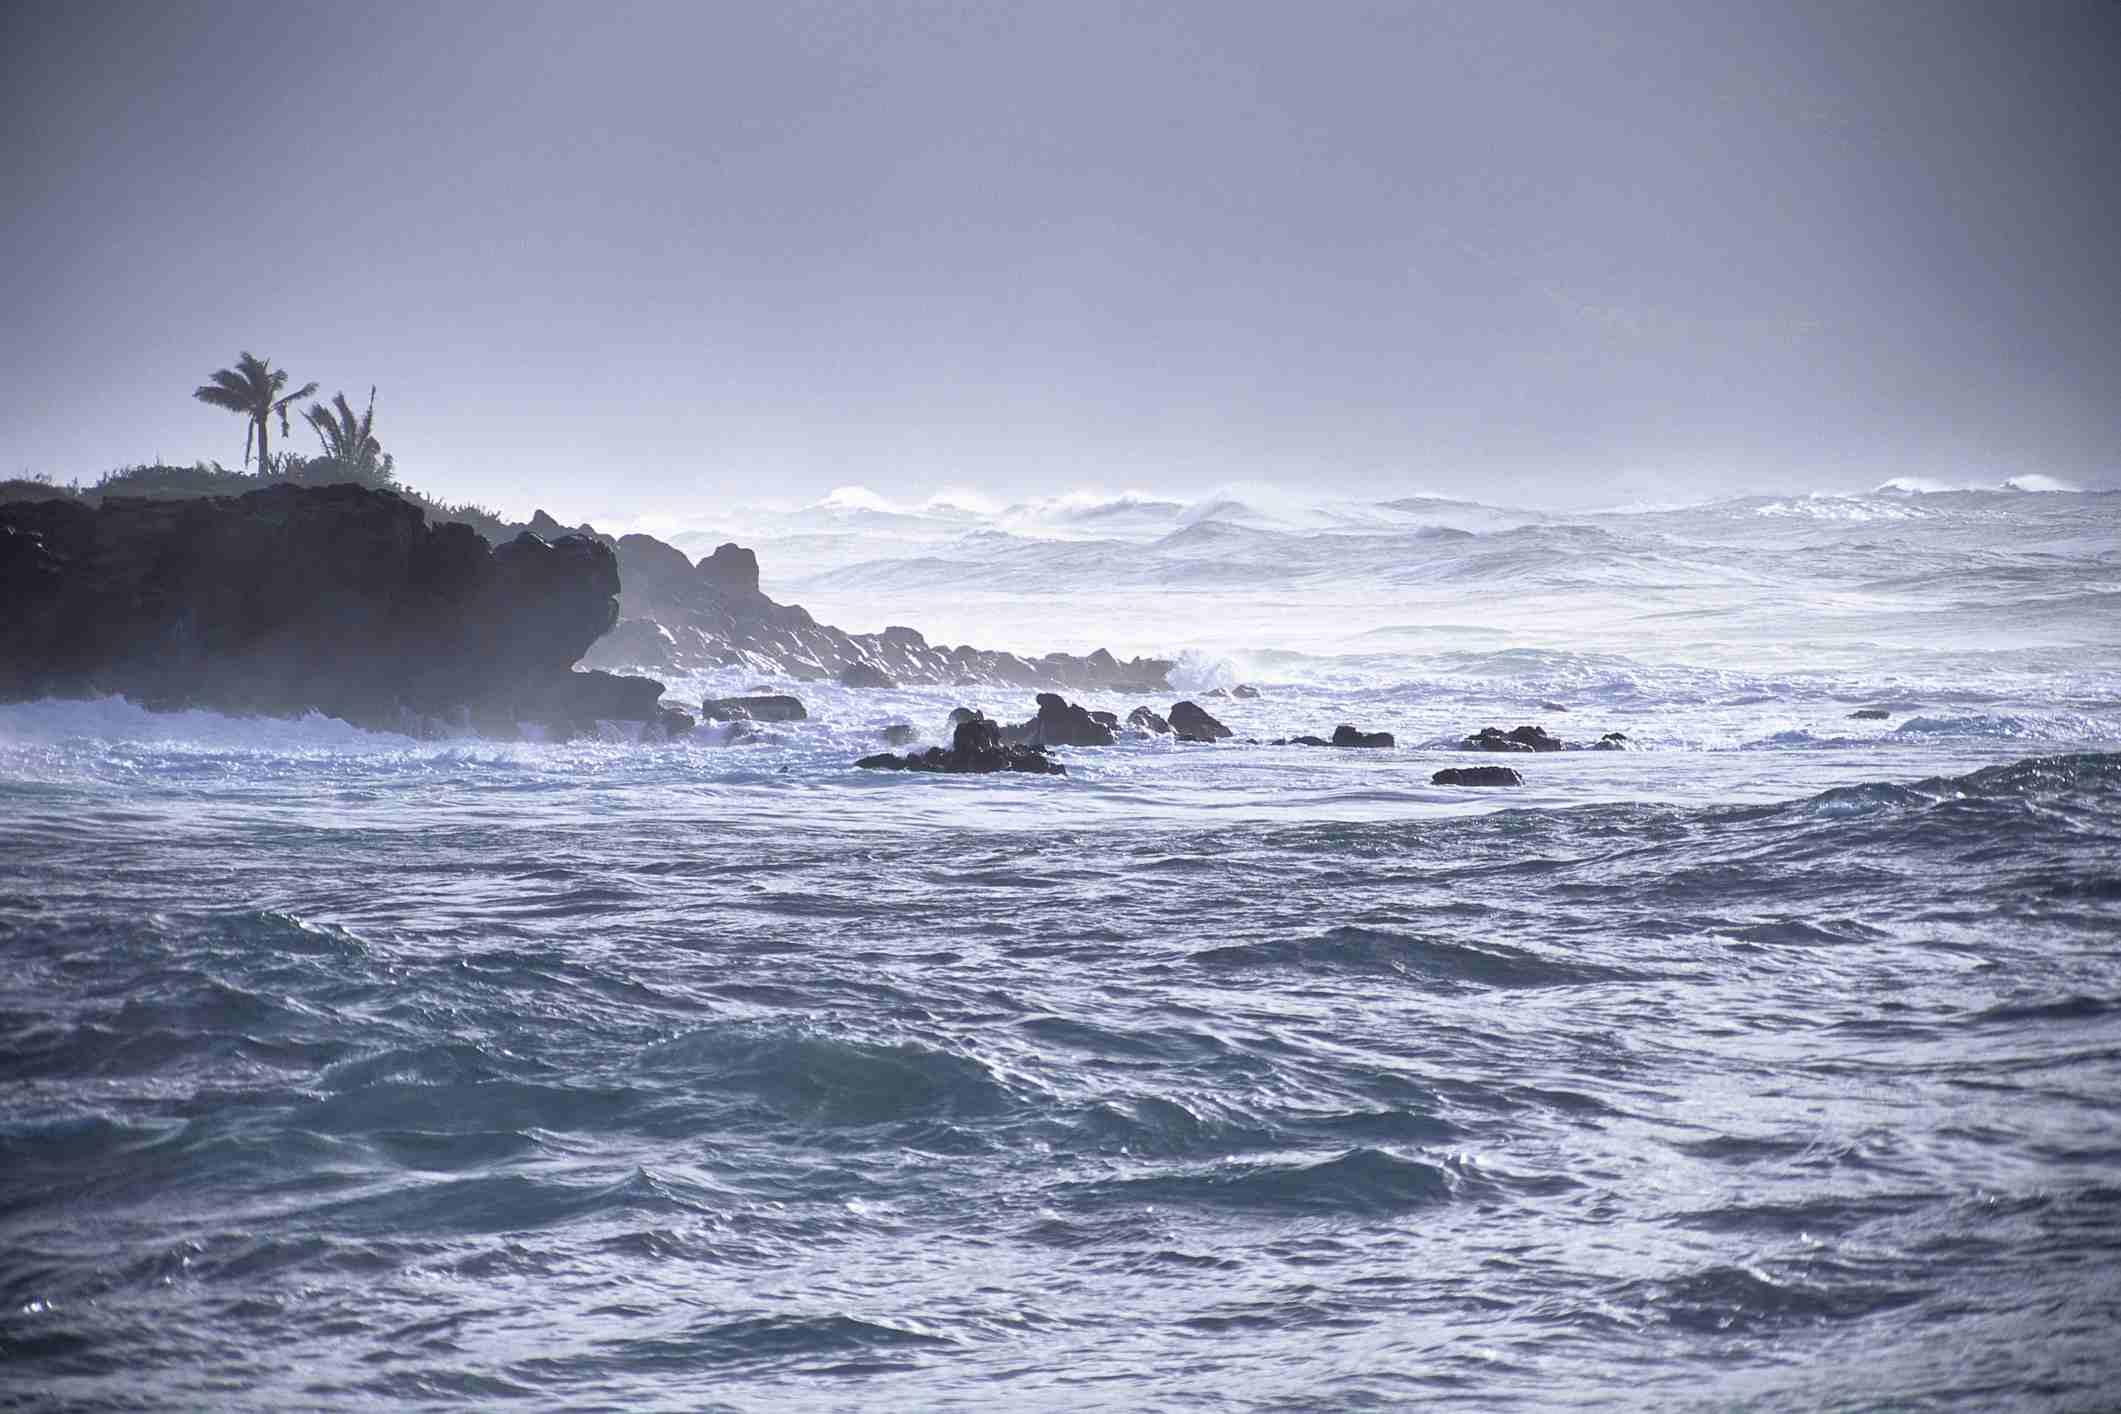 Hawaii, Oahu, North Shore, Stormy Silver Seas Off Waimea Bay Shoreline